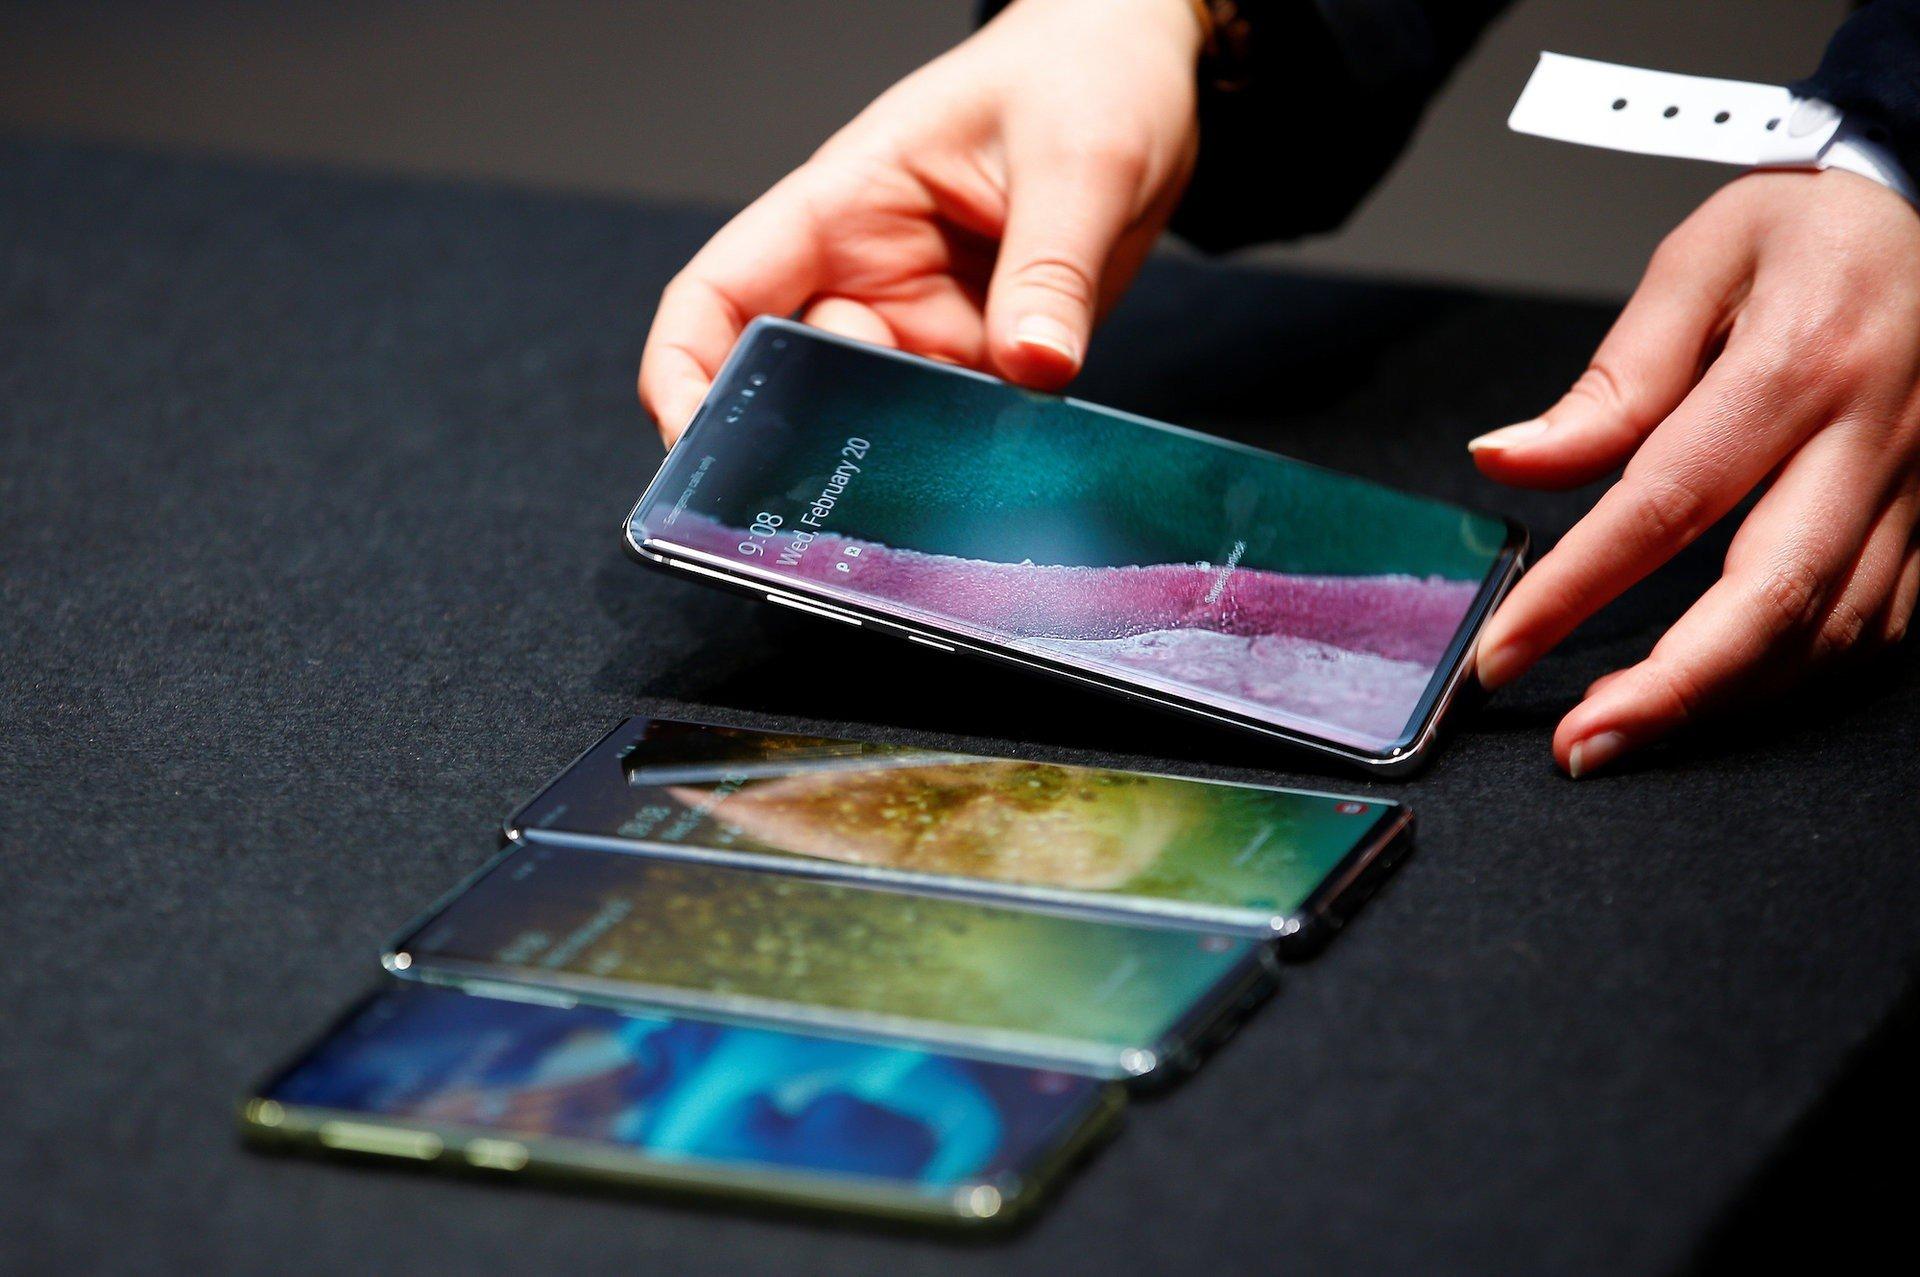 5 ways to take screenshots on your Samsung Galaxy S10